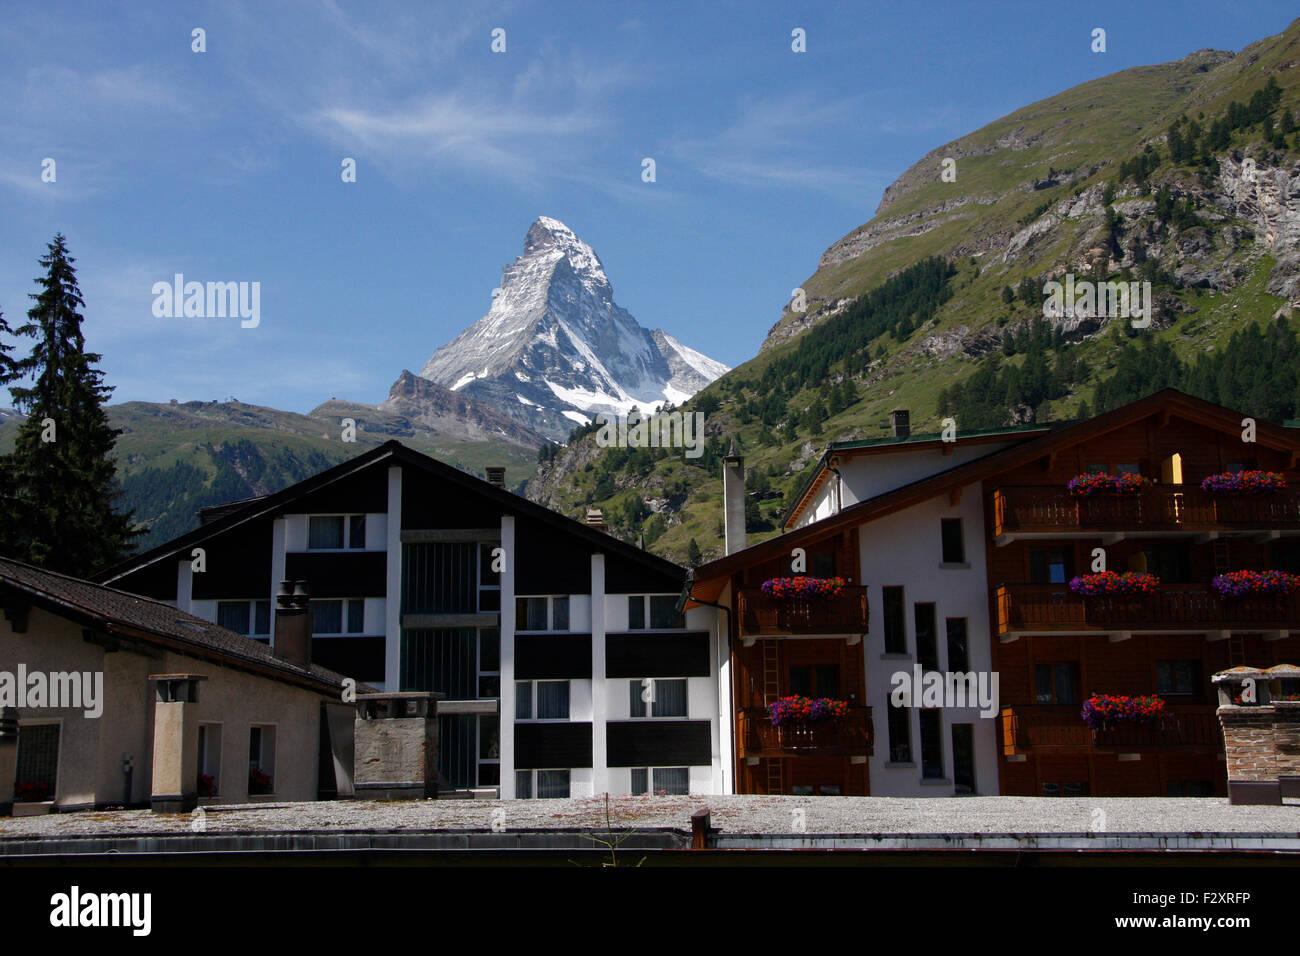 Zermatt, Matterhorn, Wallis, Schweiz/ Switzerland. - Stock Image